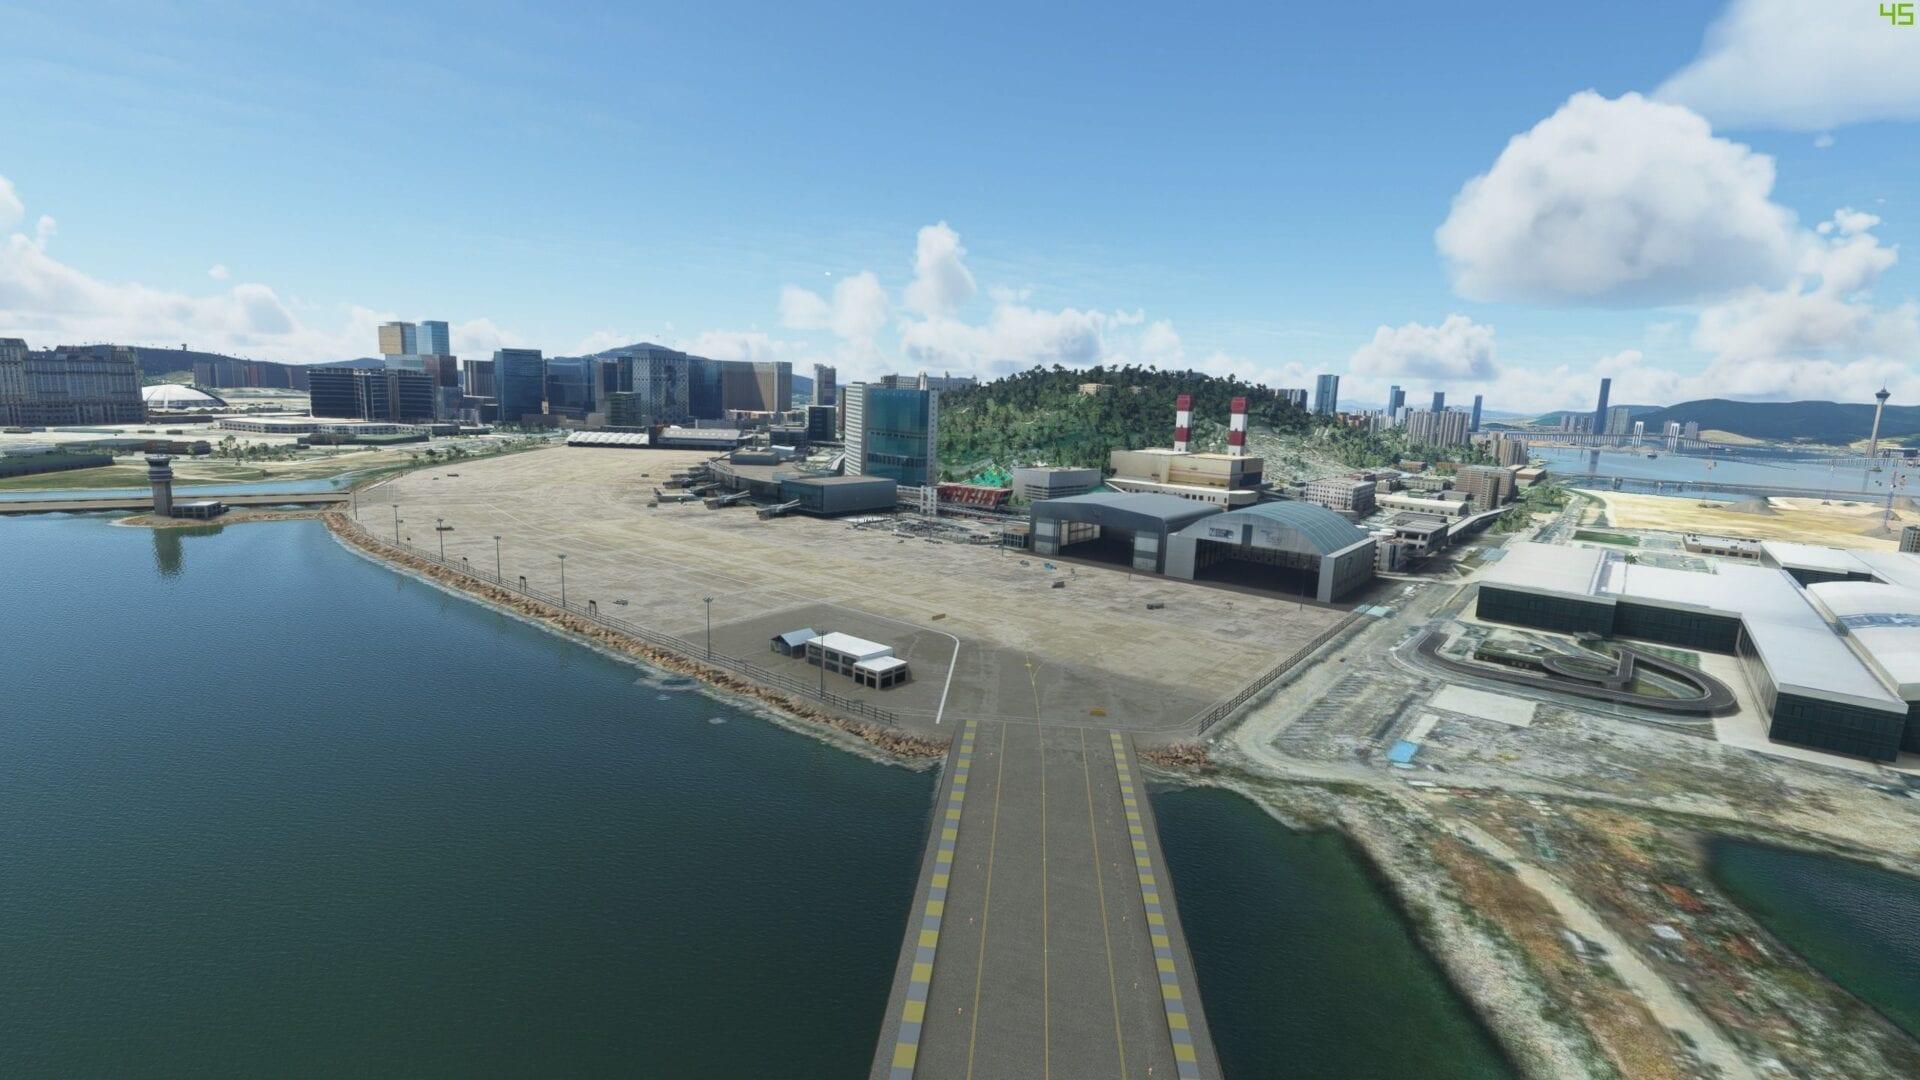 Microsoft Flight Simulator Macau Review